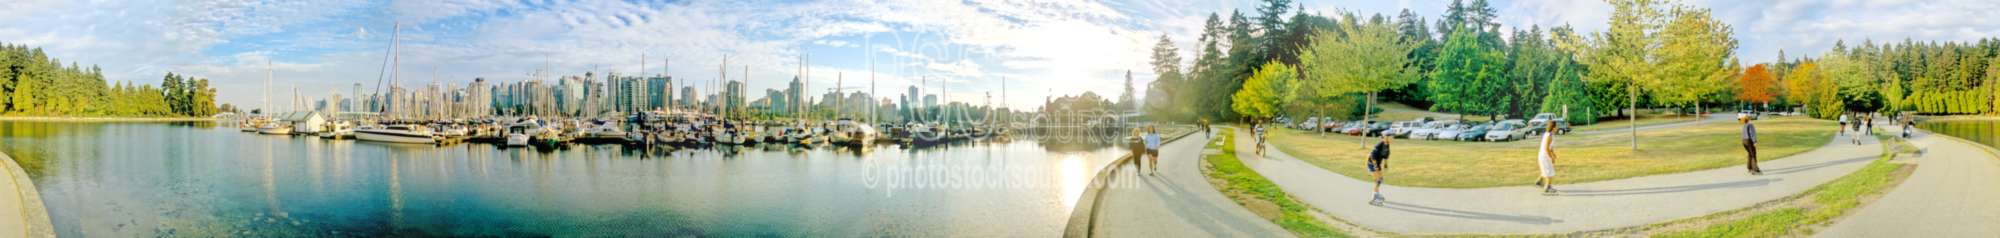 Stanley Park, Yacht Club